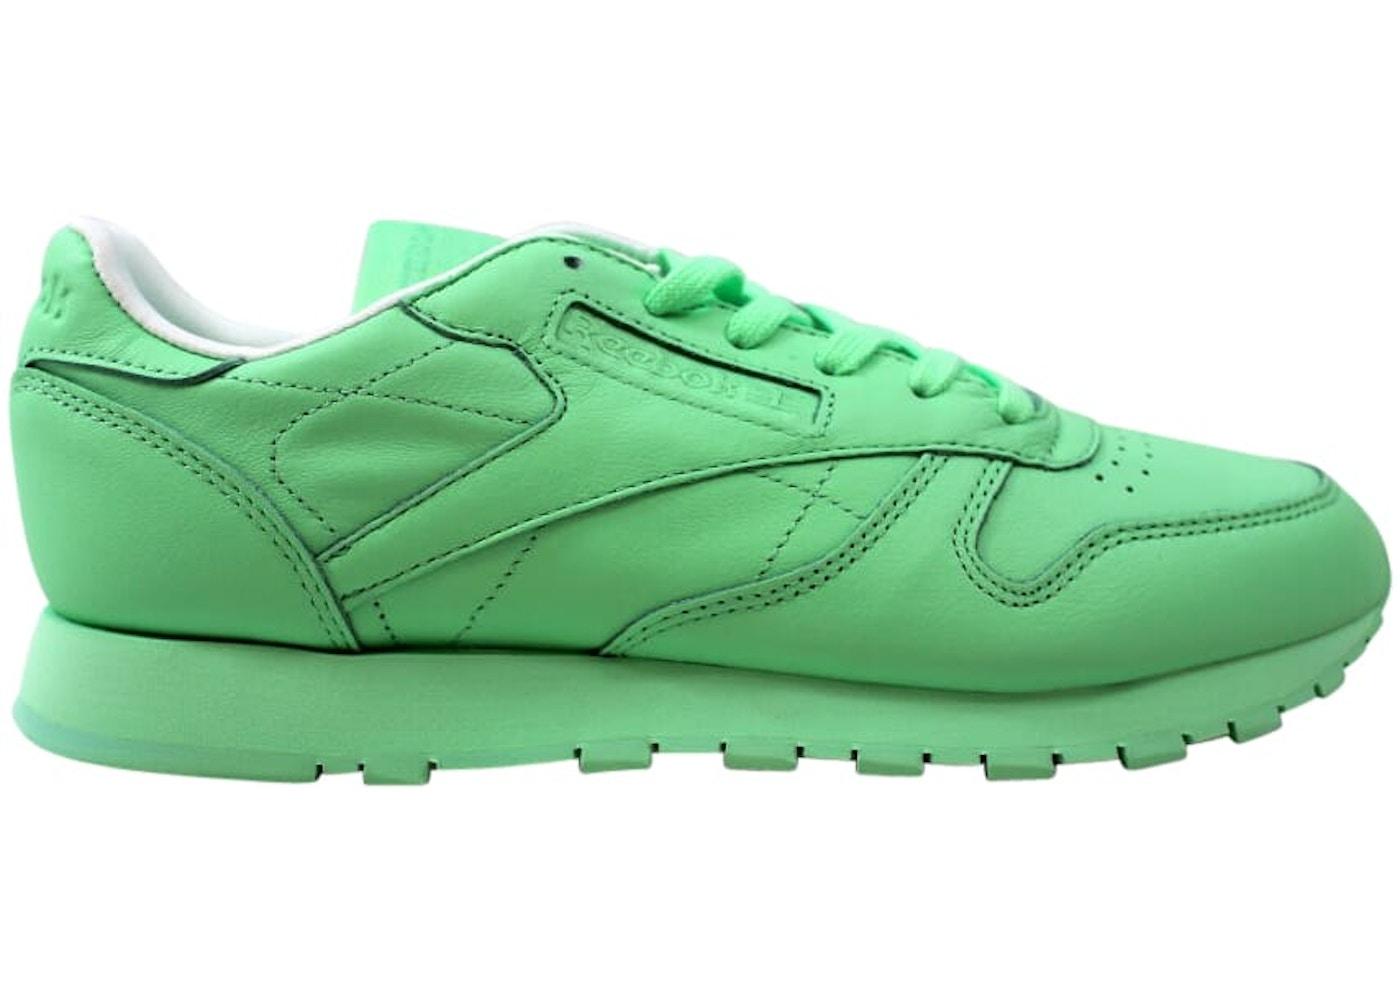 Hija ven transferencia de dinero  Reebok Classic Leather Pastels Mint Green (W) - BD2773